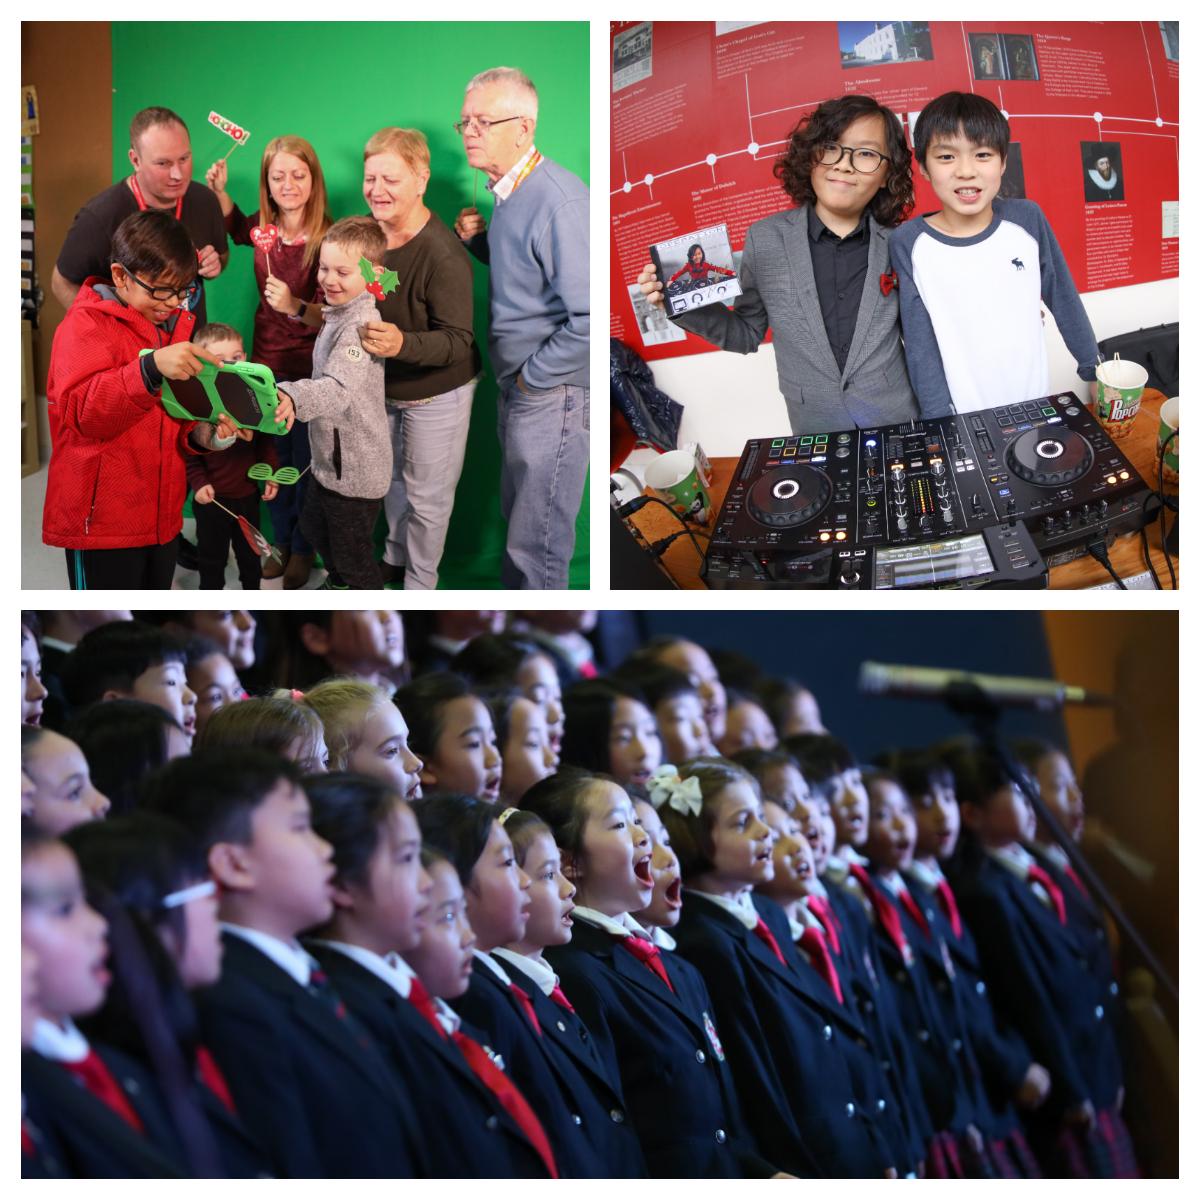 fotojet-1-上海德威外籍人员子女学校(浦东)